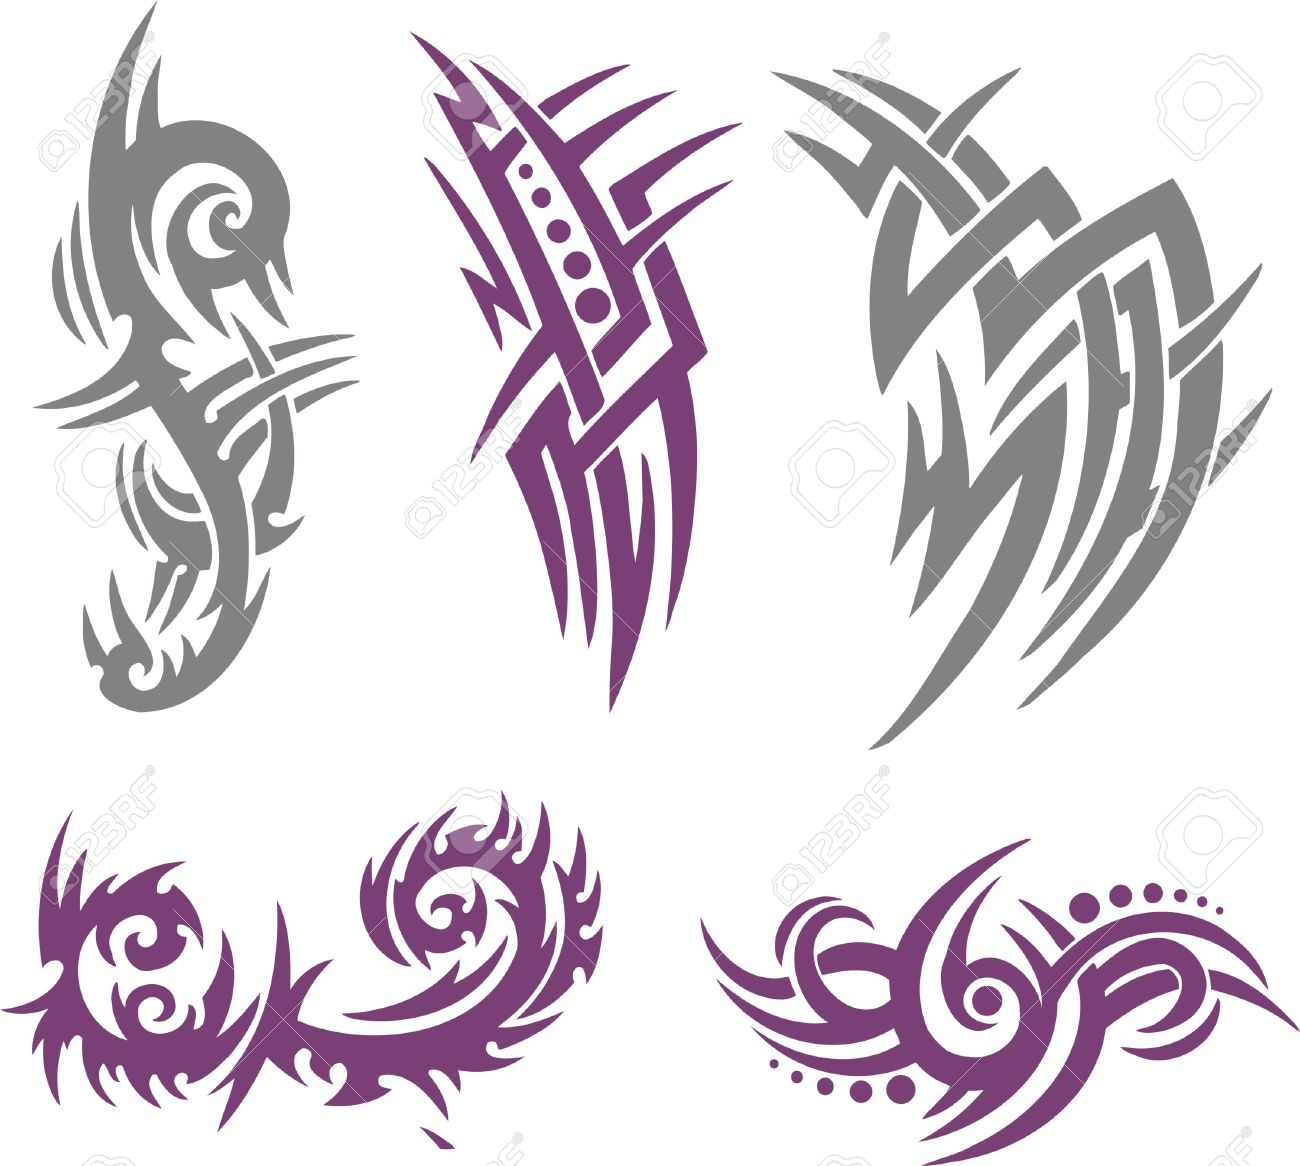 Tribal-Tattoos 8070180-Tribal-Tattoo-Set-Vector-Illustration-Collection-Stock-Vector-design